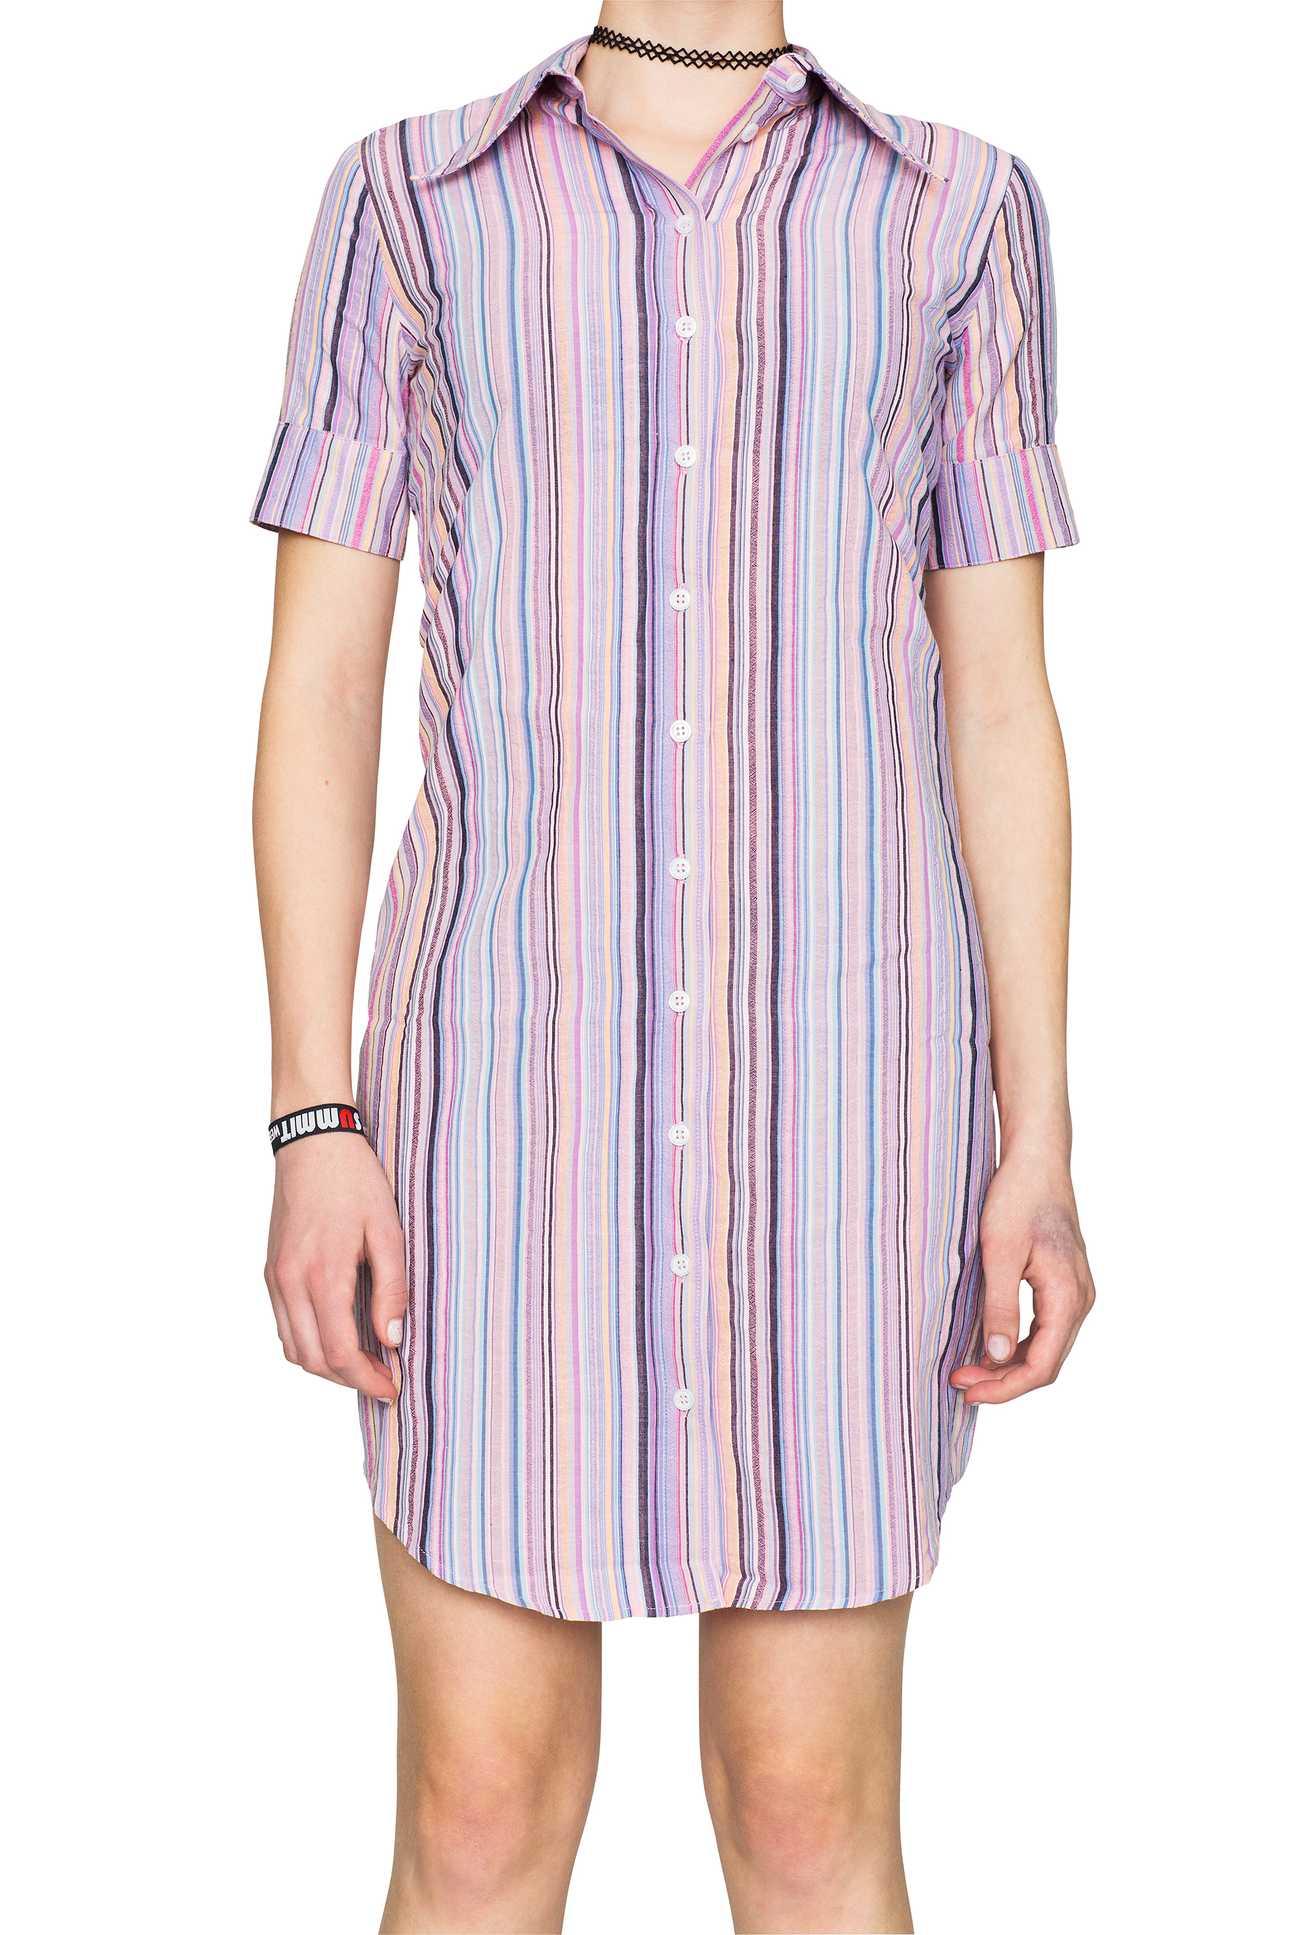 Product image Shirt Dress